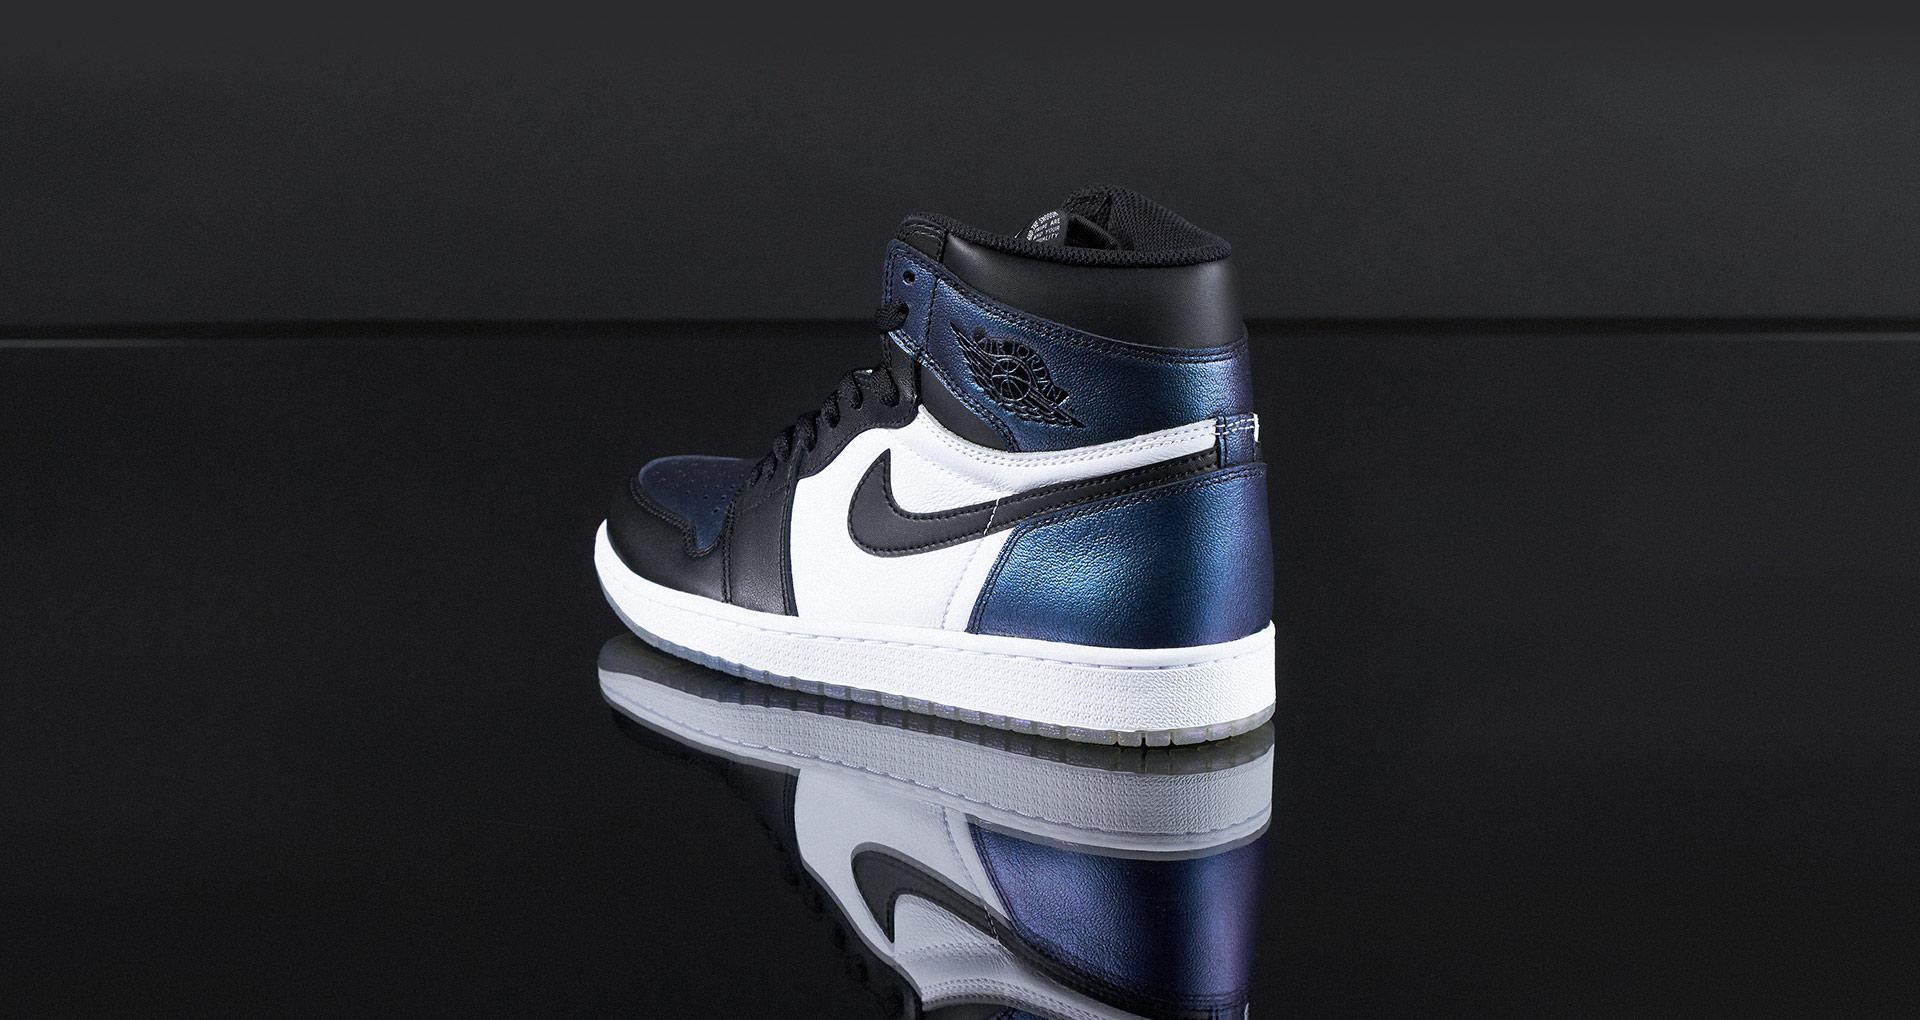 6 Days 6 Sneakers 1 AJ 1